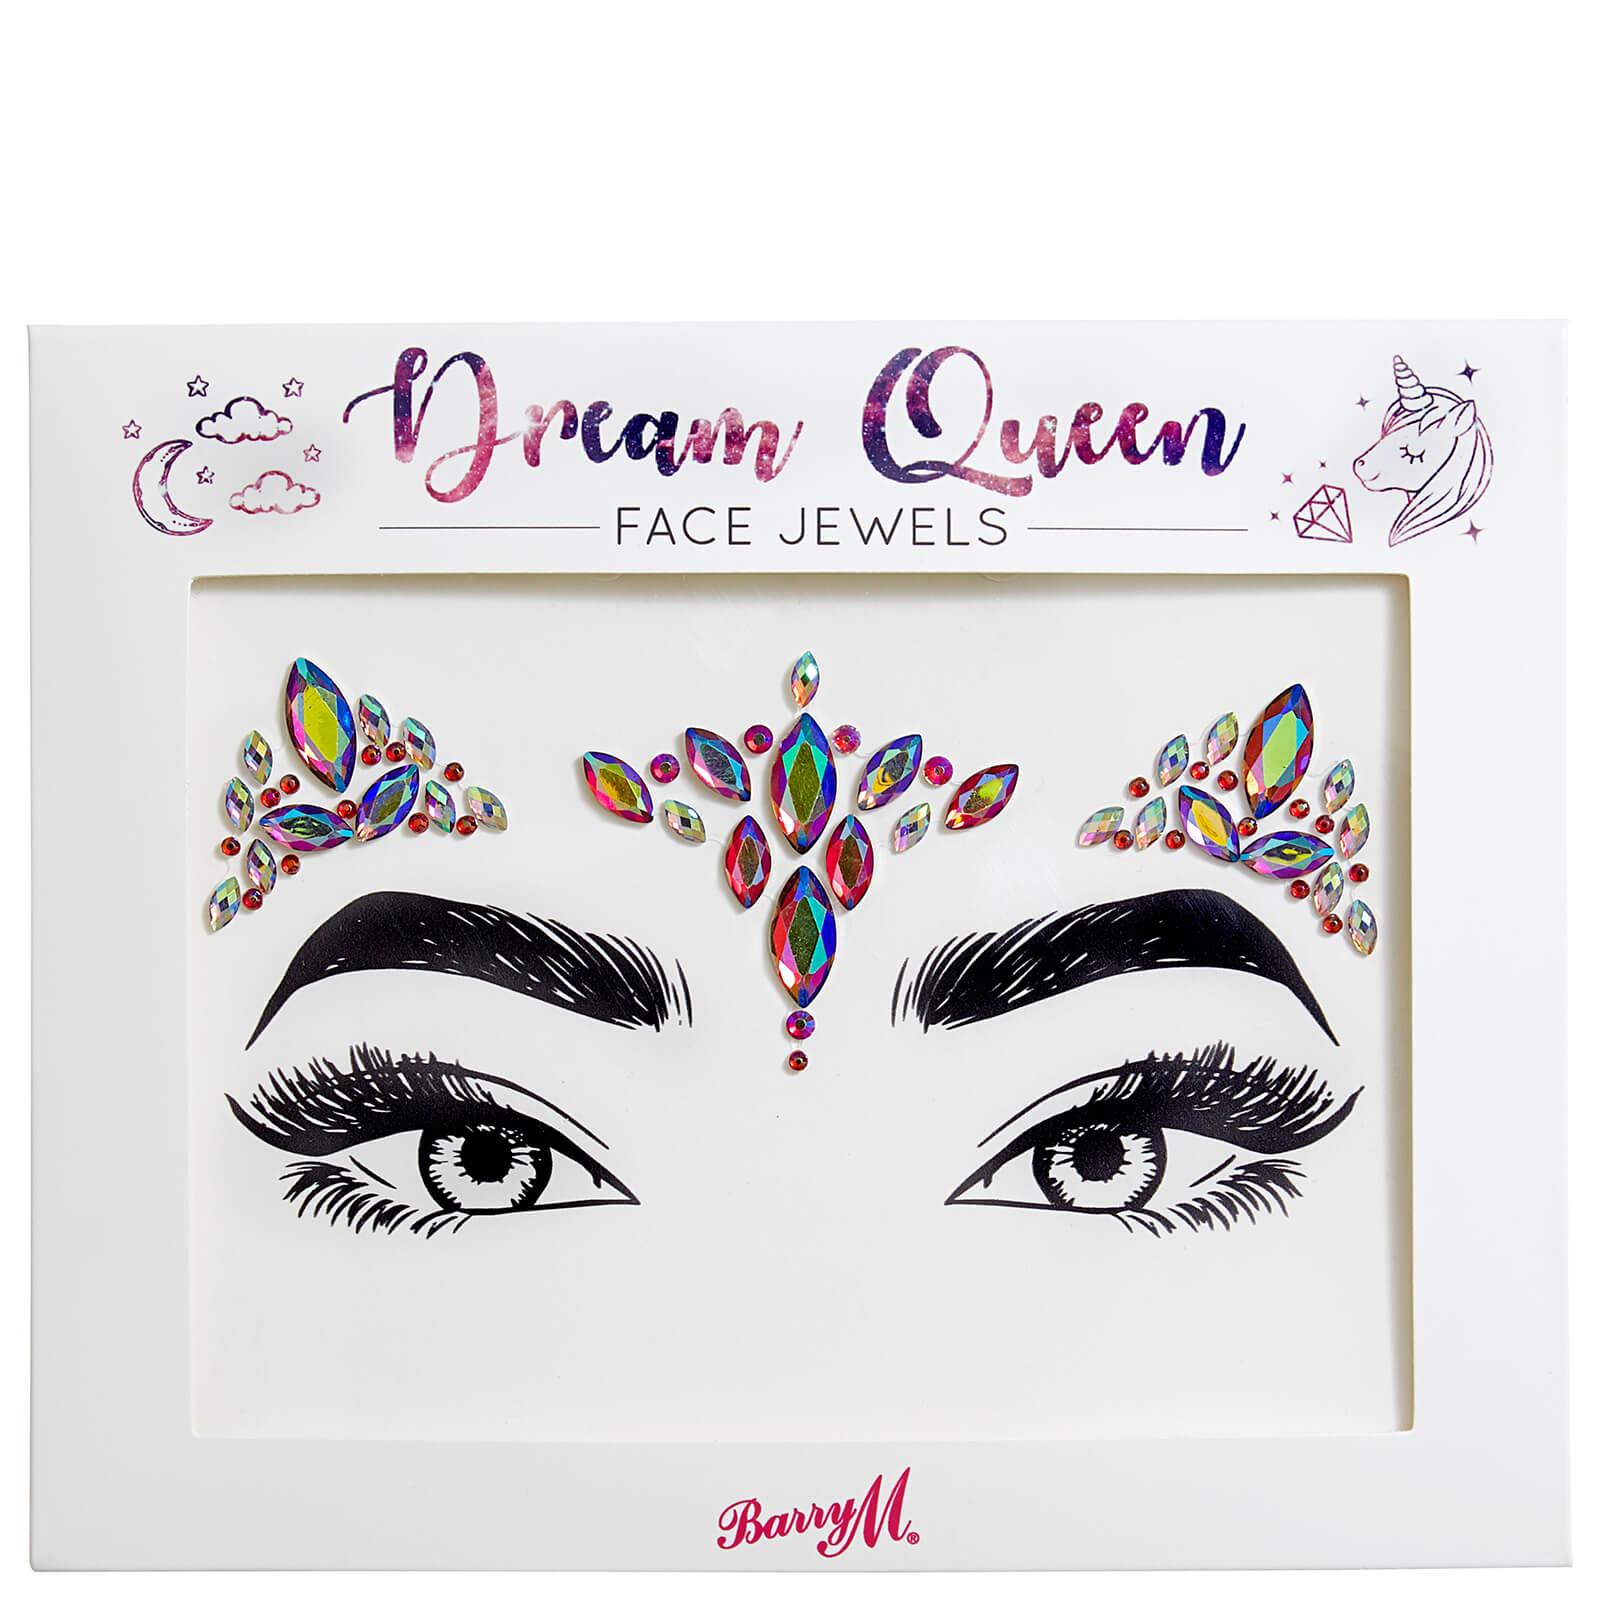 65257ca0eb Barry M Cosmetics Face Jewels - Dream Queen